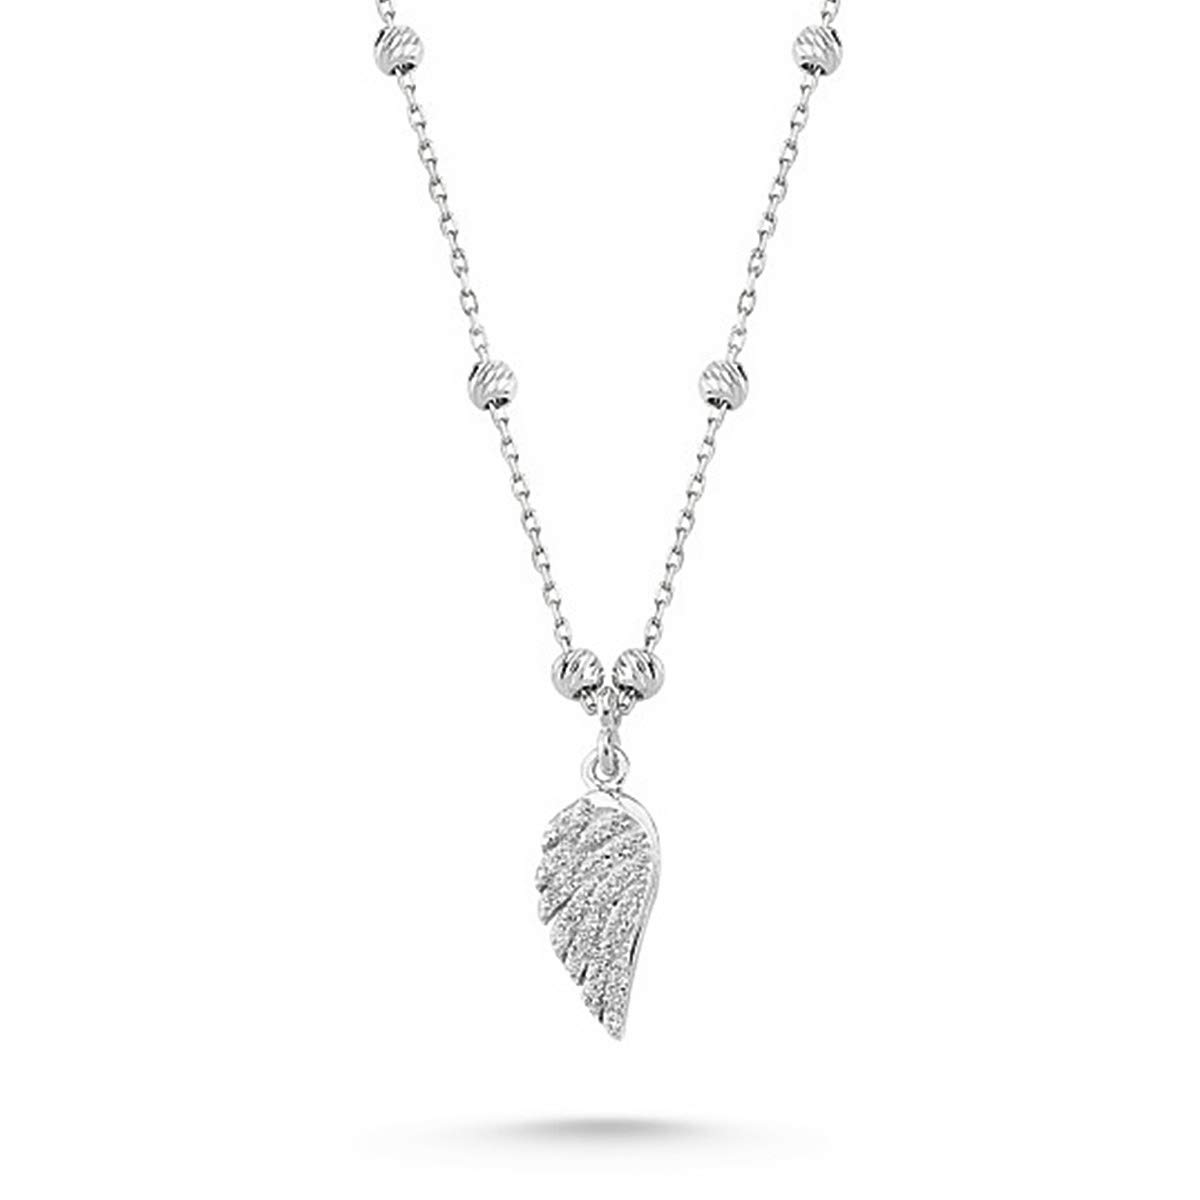 Engelsfl/ügel Zirkonia 42cm Kette 925 Echt Silber Kinder Damen M/ädchen Halskette Fl/ügel